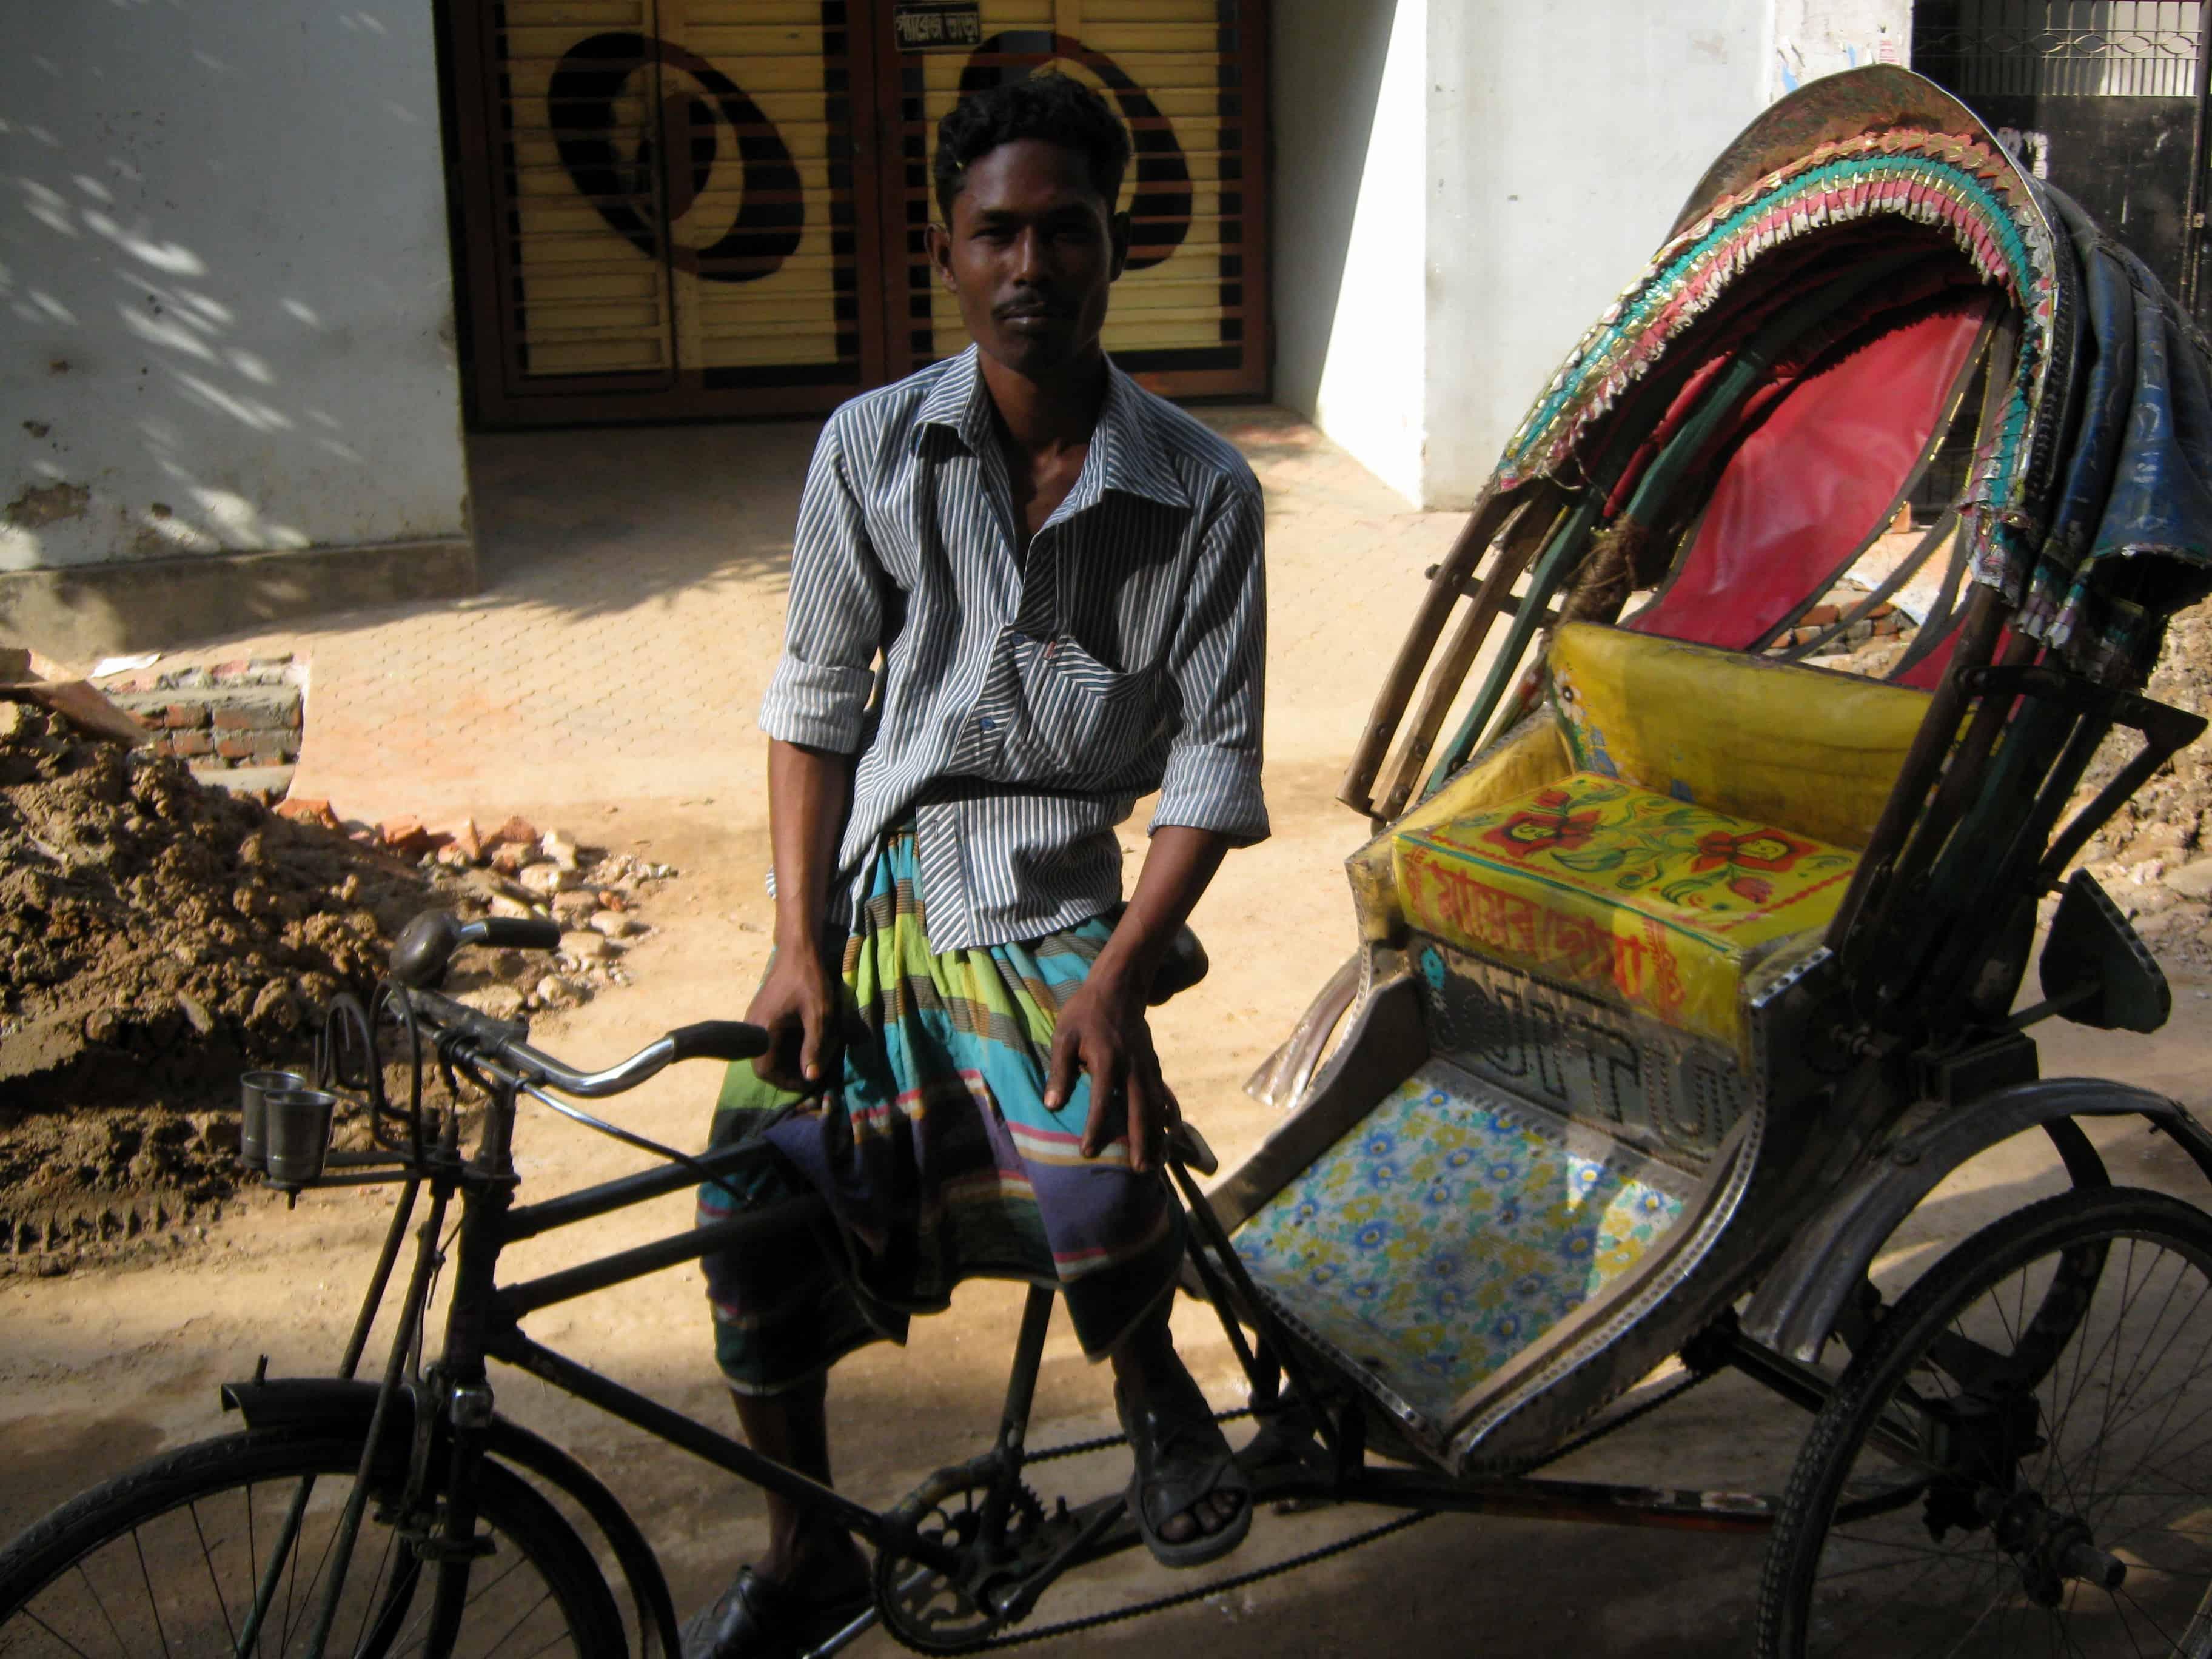 Bangladesh Travel Blog